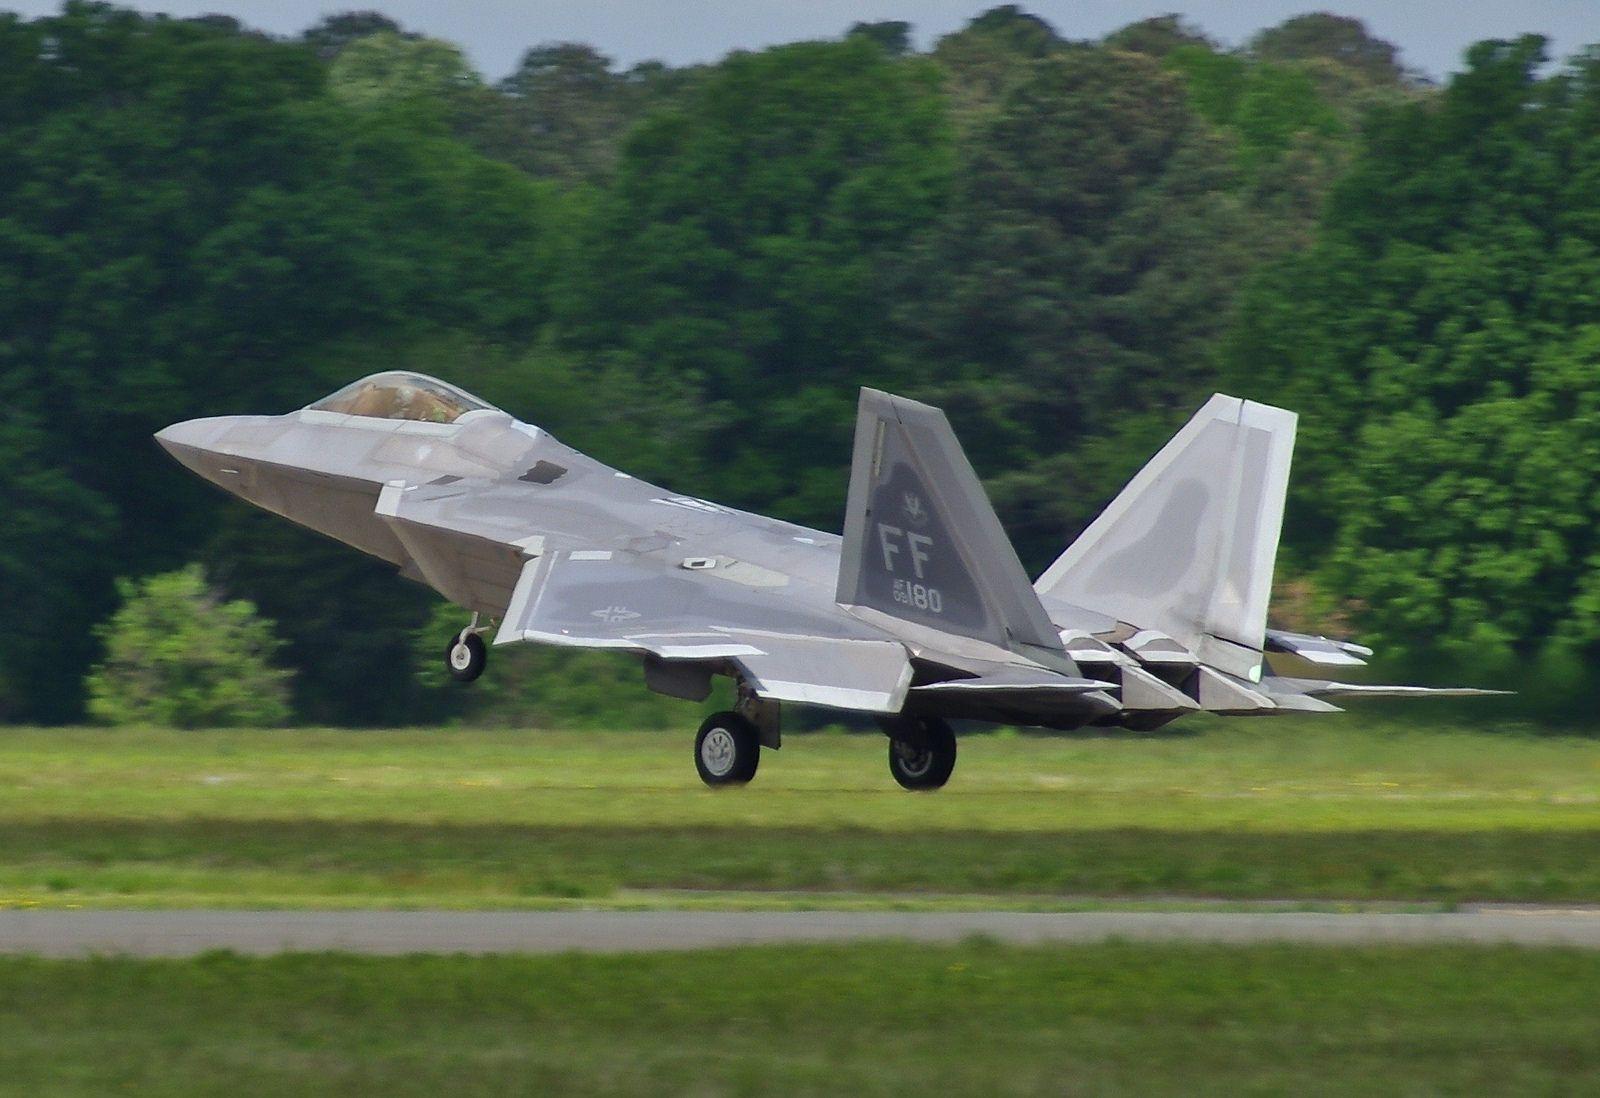 09-4180 F-22A 1FW